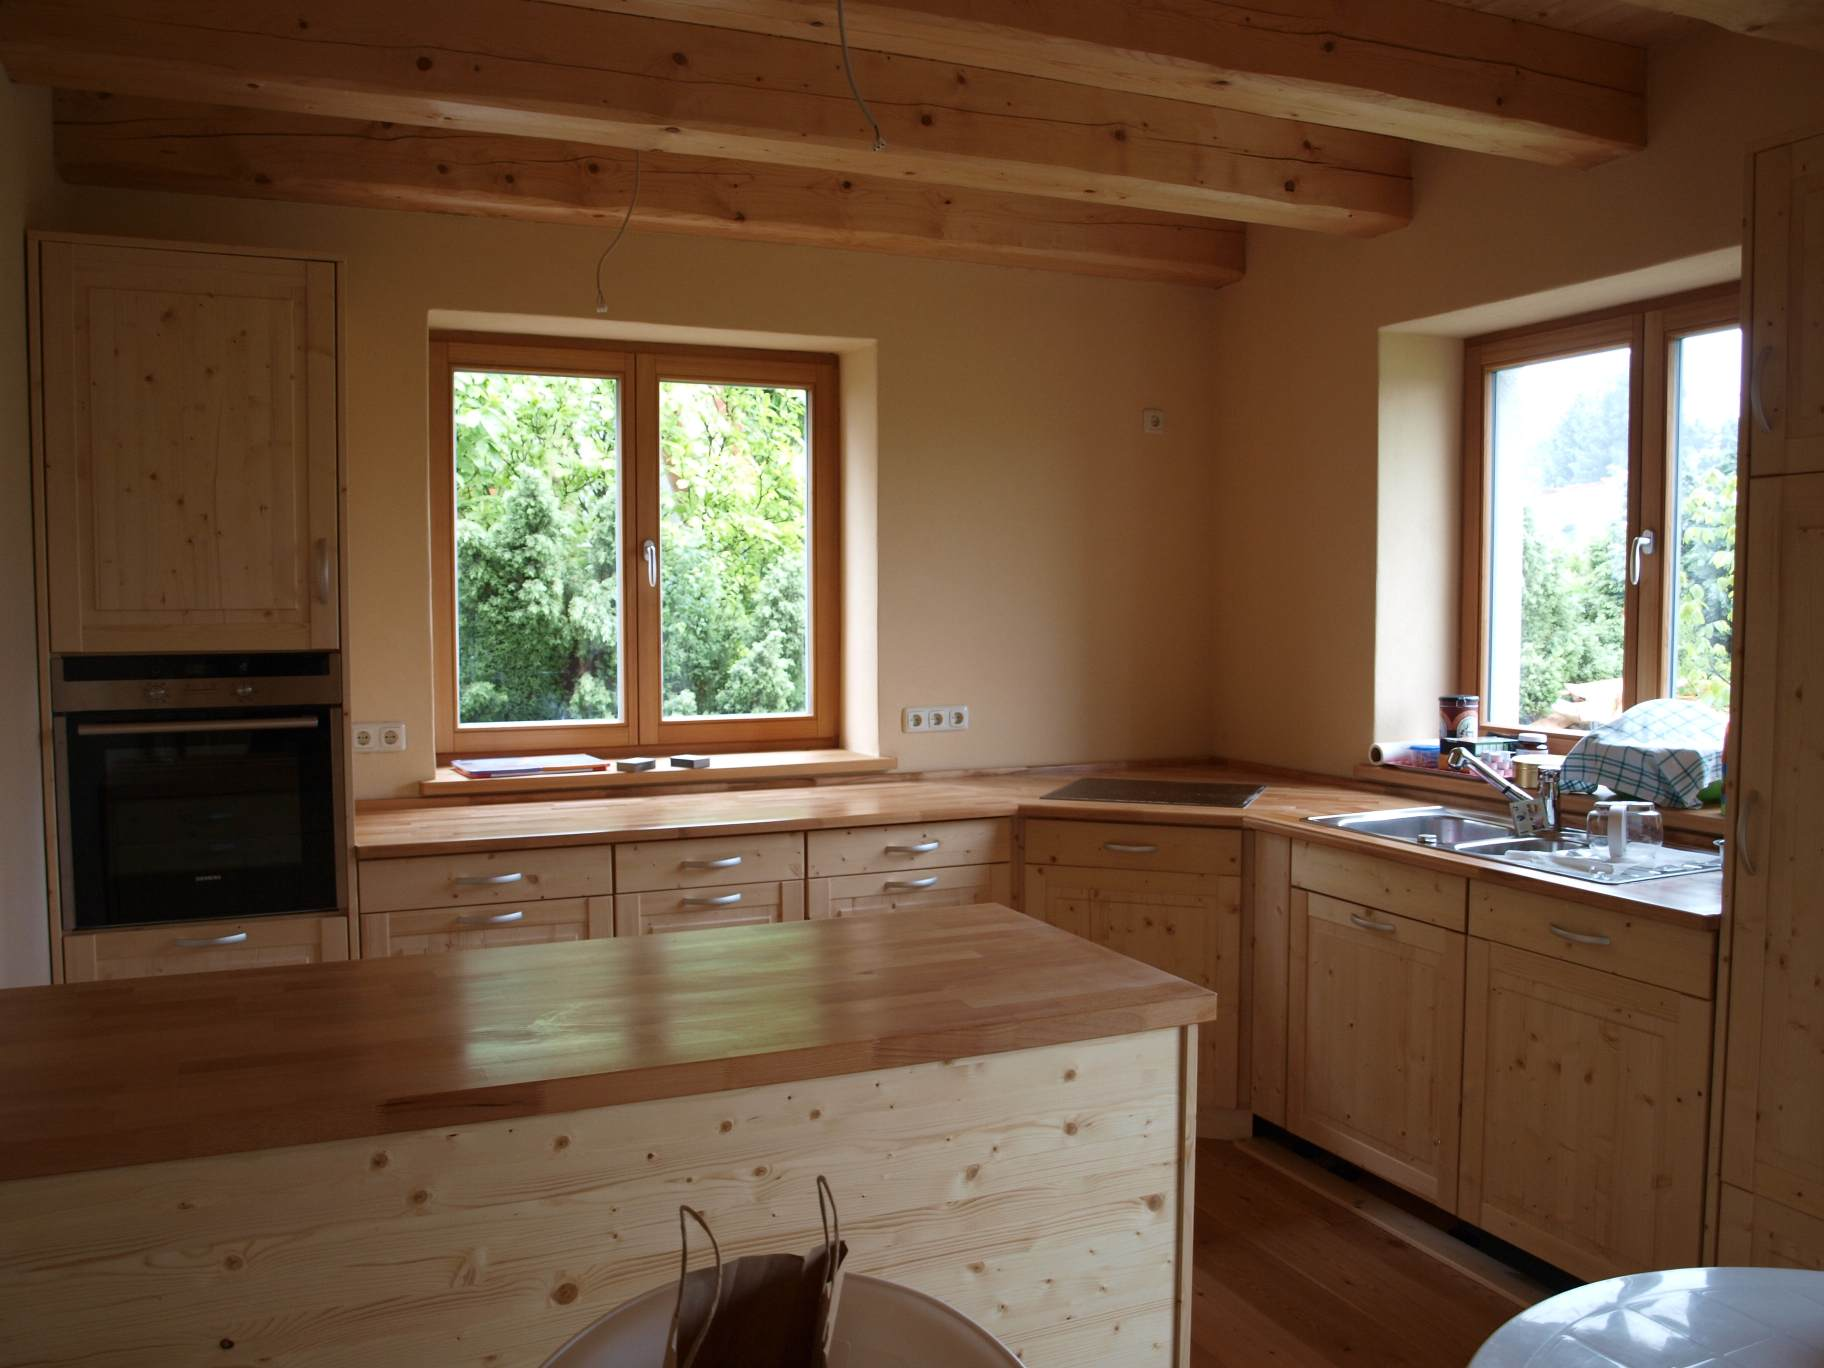 ein leipziger hausbau blog. Black Bedroom Furniture Sets. Home Design Ideas